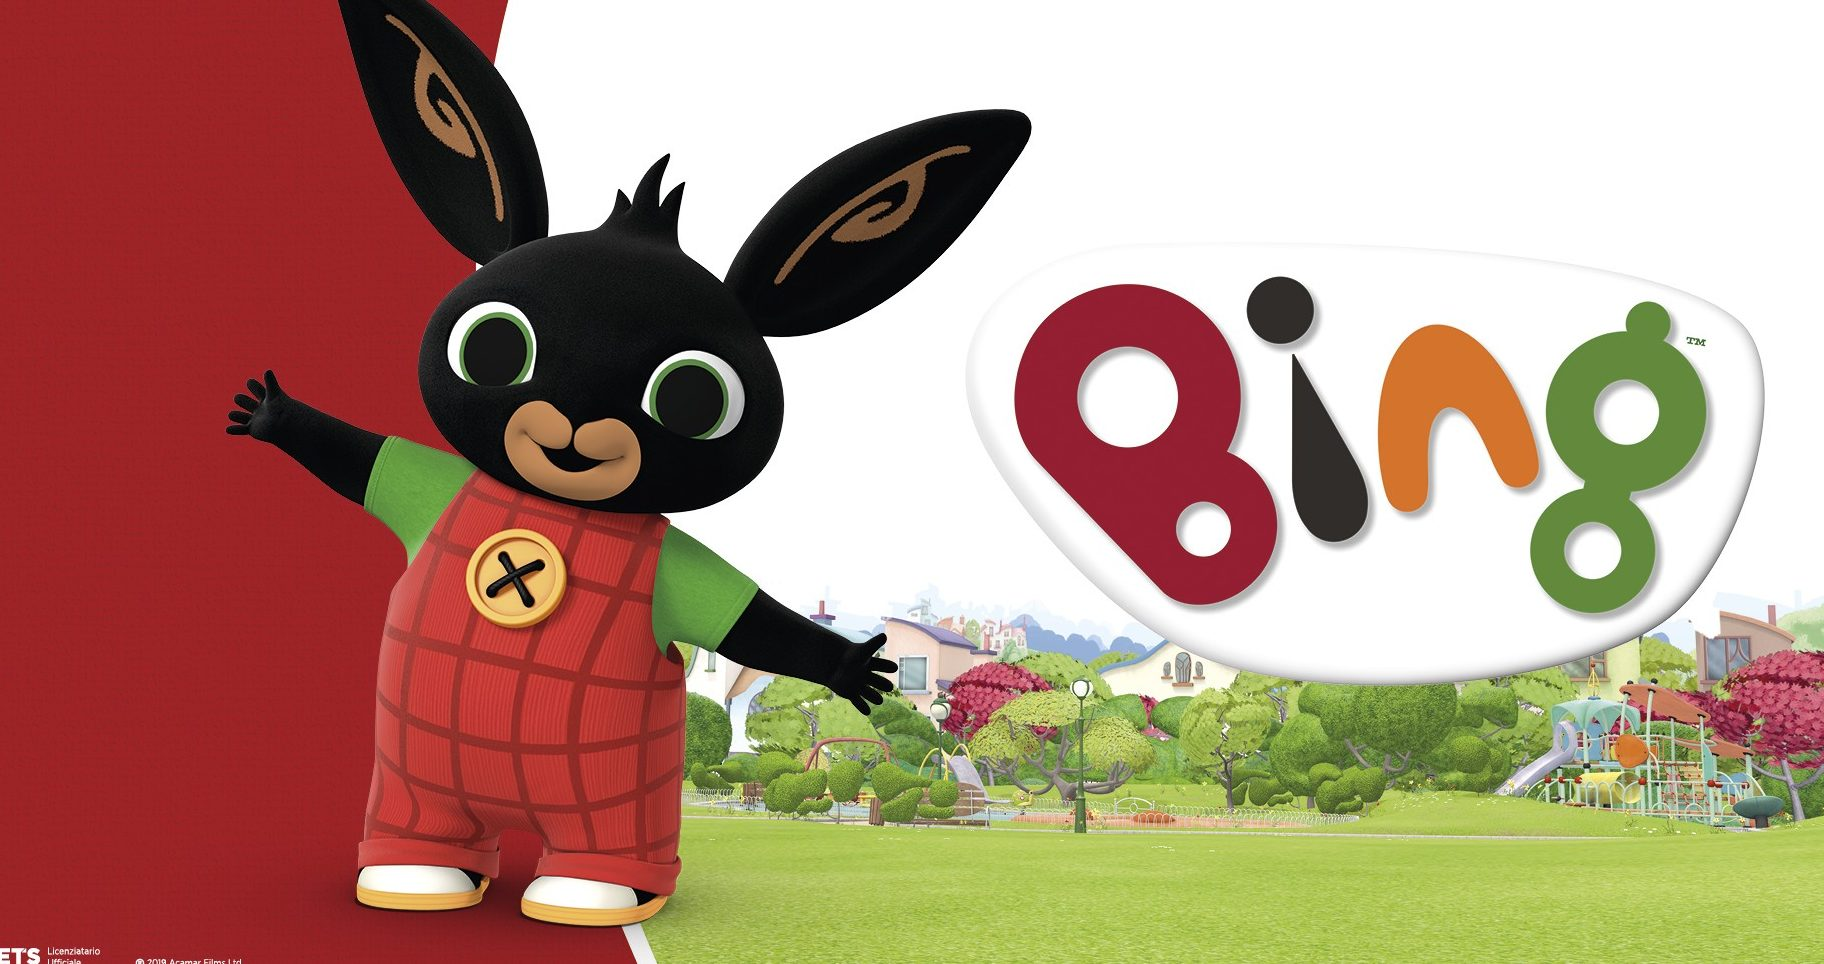 Lucca Bimbi 2020 Bing-lucca-bimbi-2020-1-e1601214728856